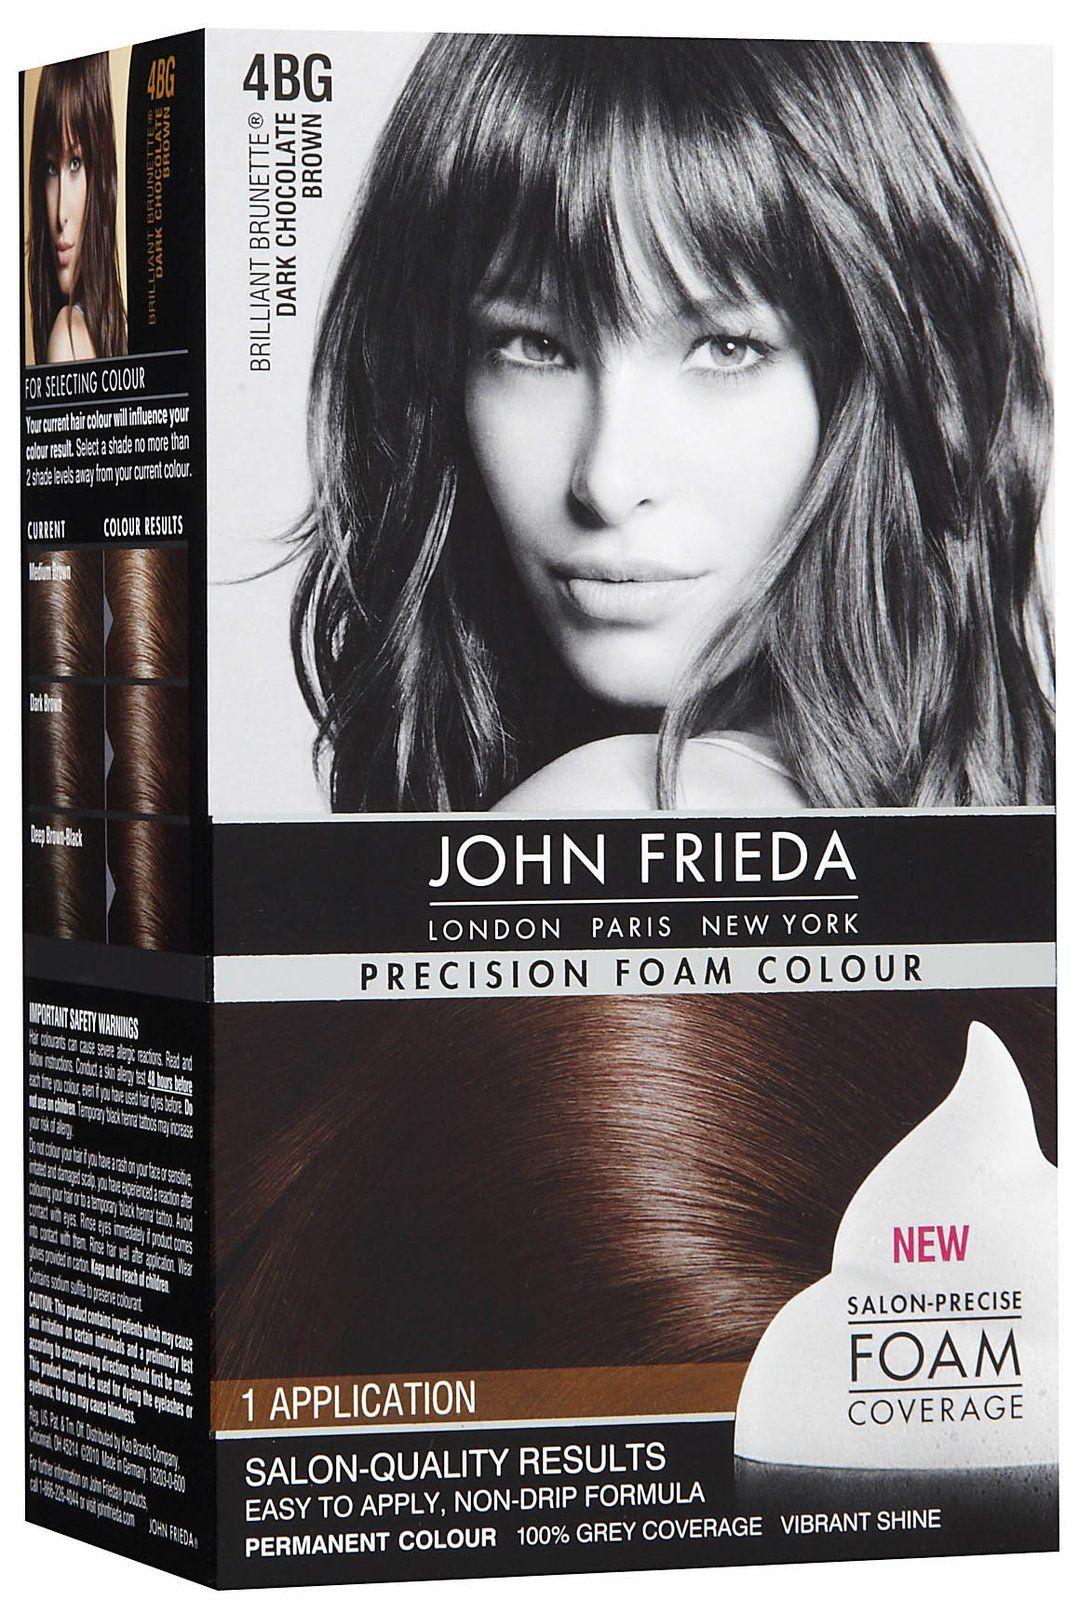 John Frieda Dark Chocolate Brown Precision Foam Color Products I